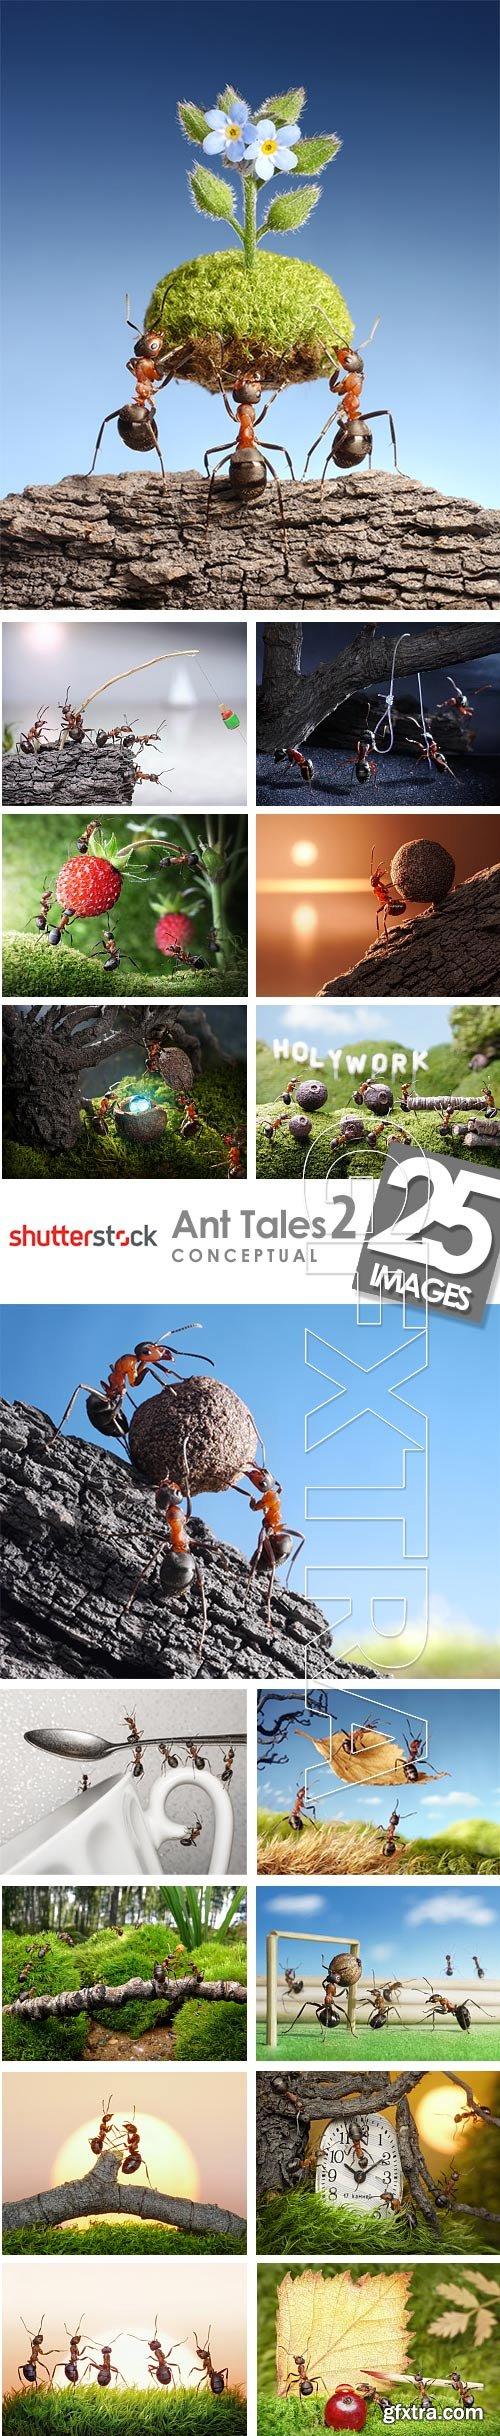 Ant Tales 2 - Conceptual Photo Art 25xJPG